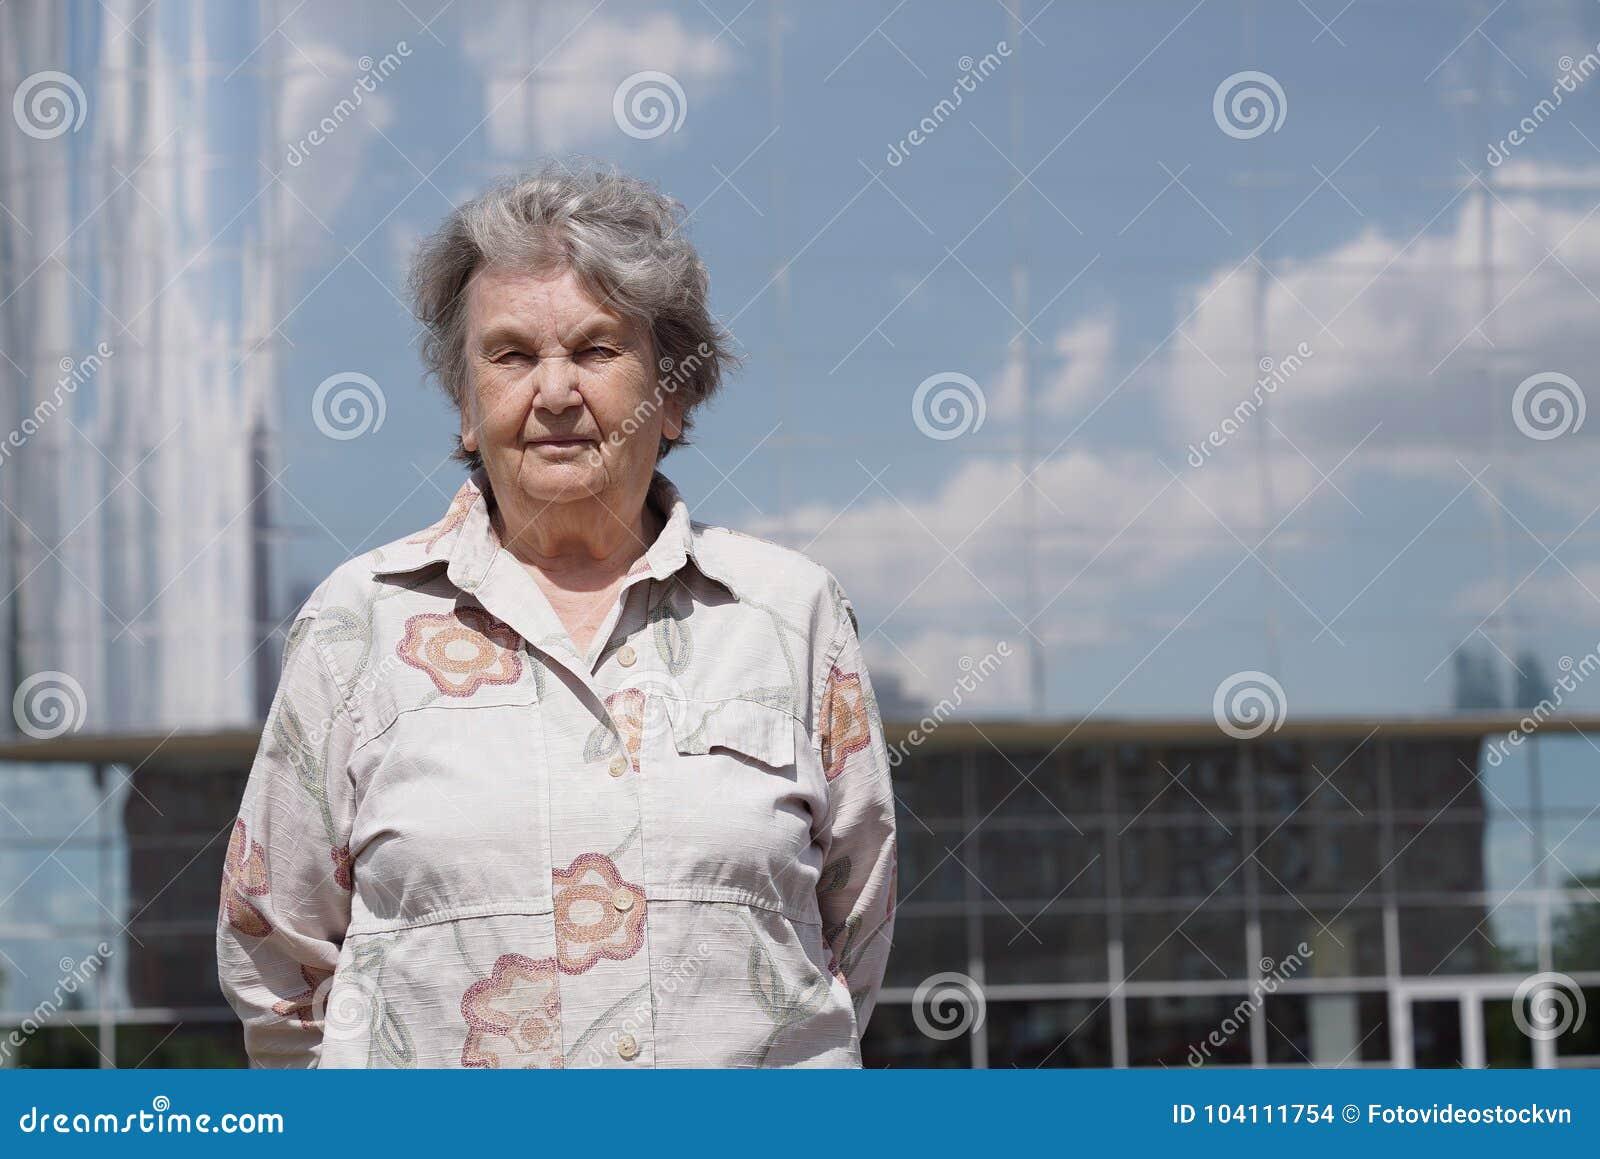 Adult mature old free